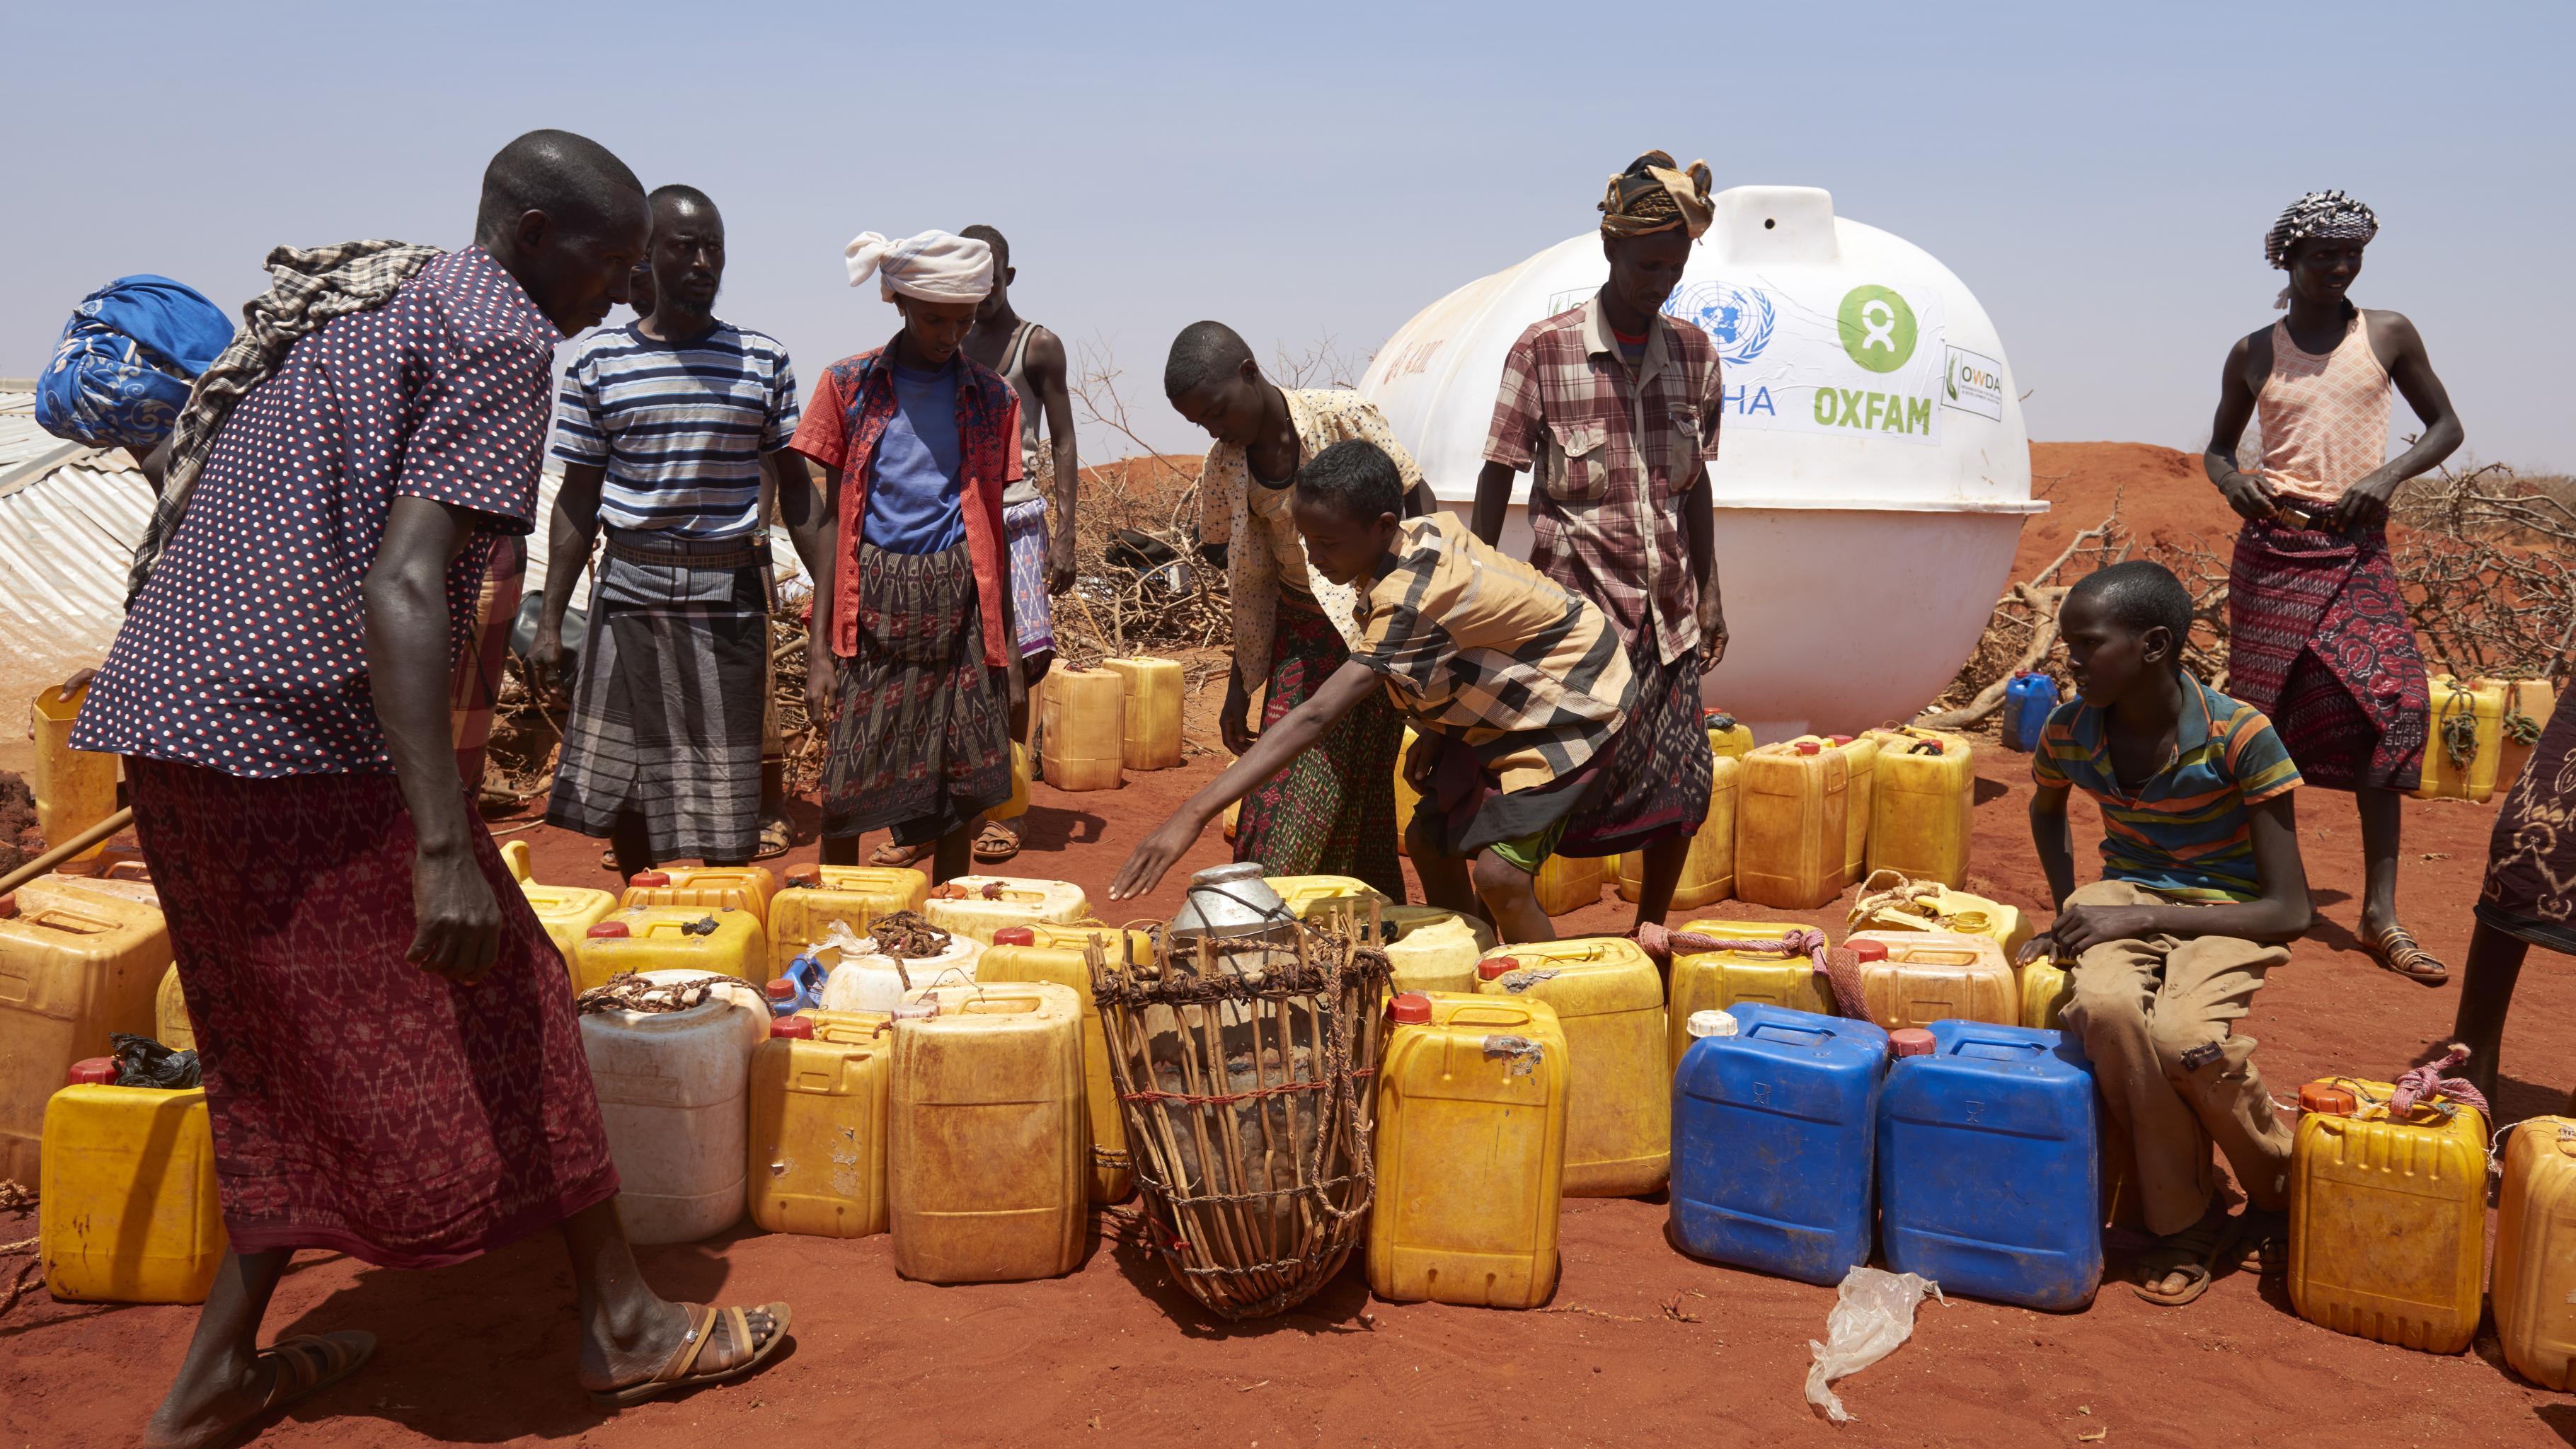 Dürre in Ostafrika: Wasserversorung in Äthiopien